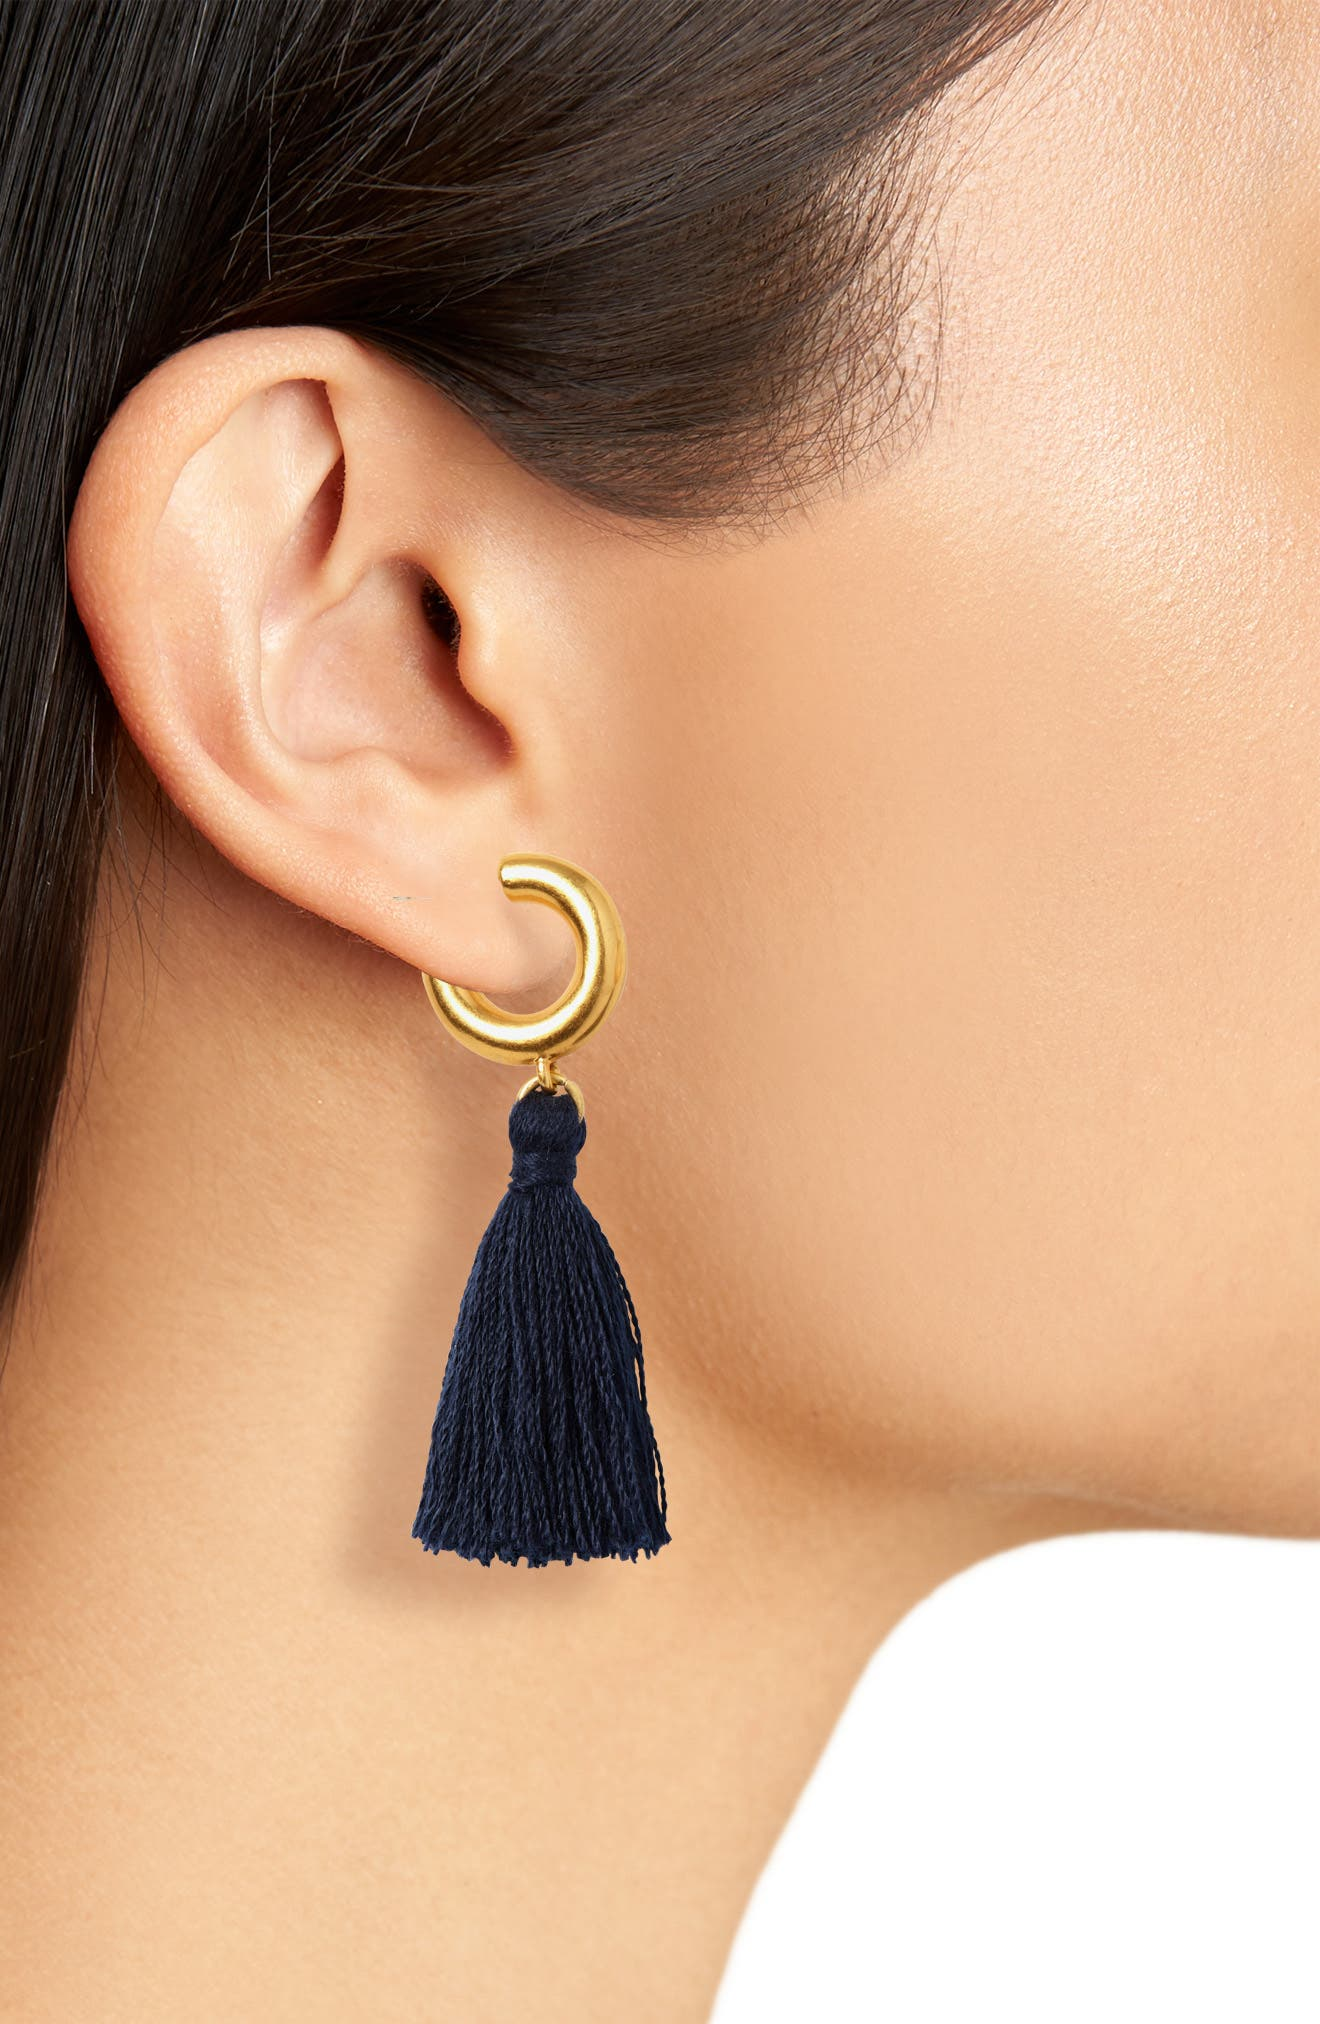 f33bac7e6abaaa Women's Madewell Earrings | Nordstrom